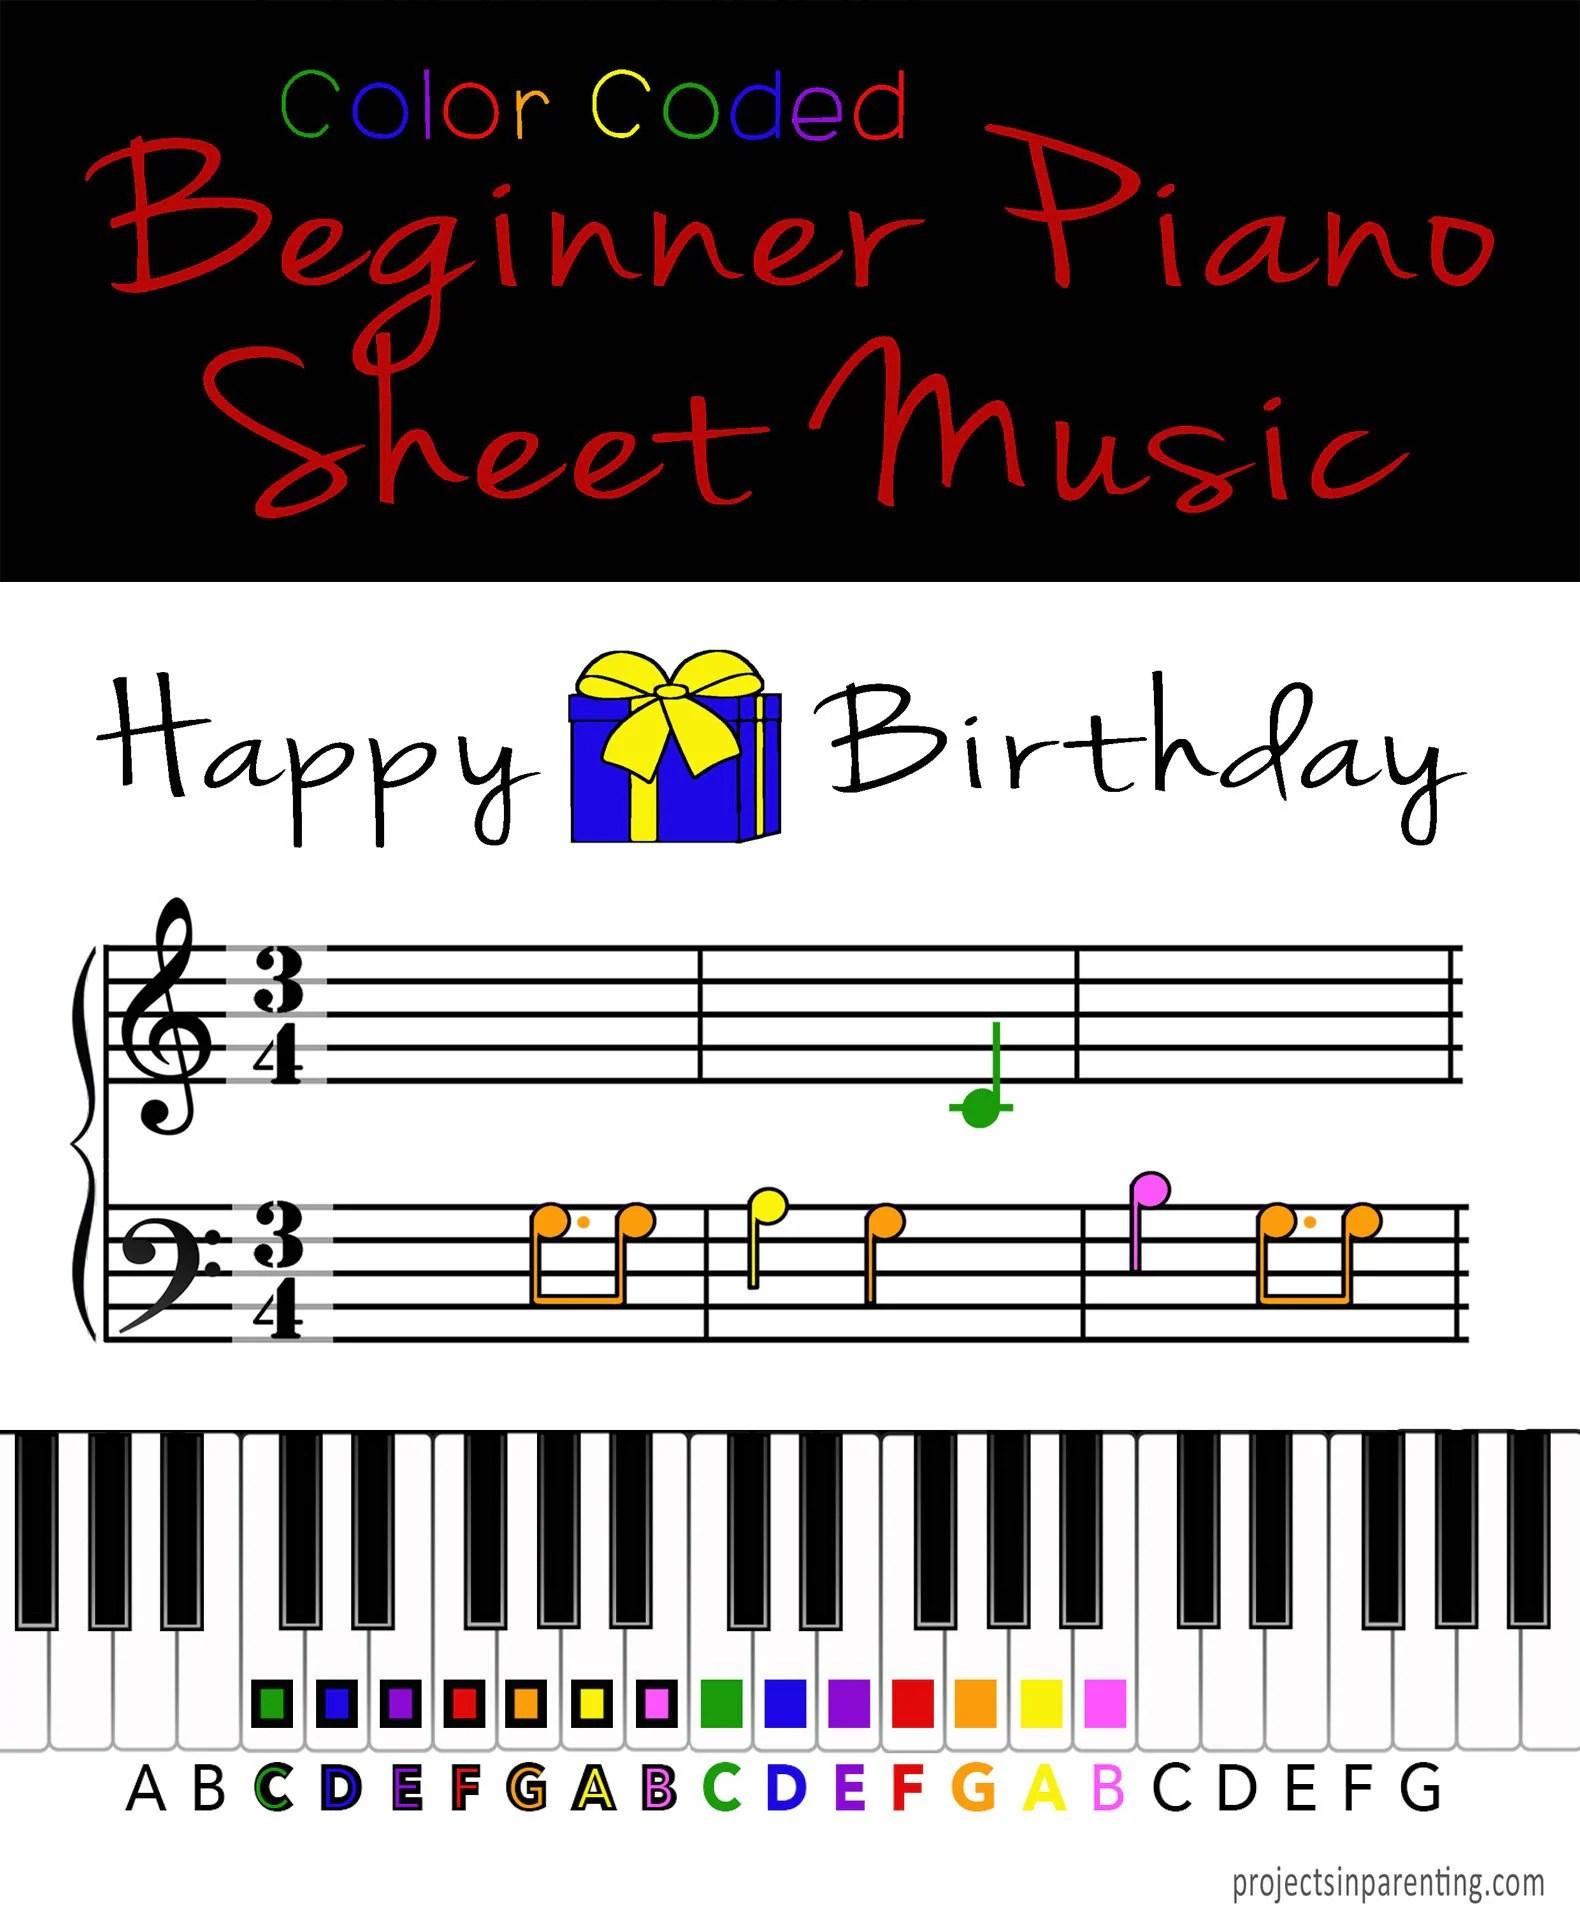 Happy Birthday Color Coded Beginner Piano Music Sheet Etsy